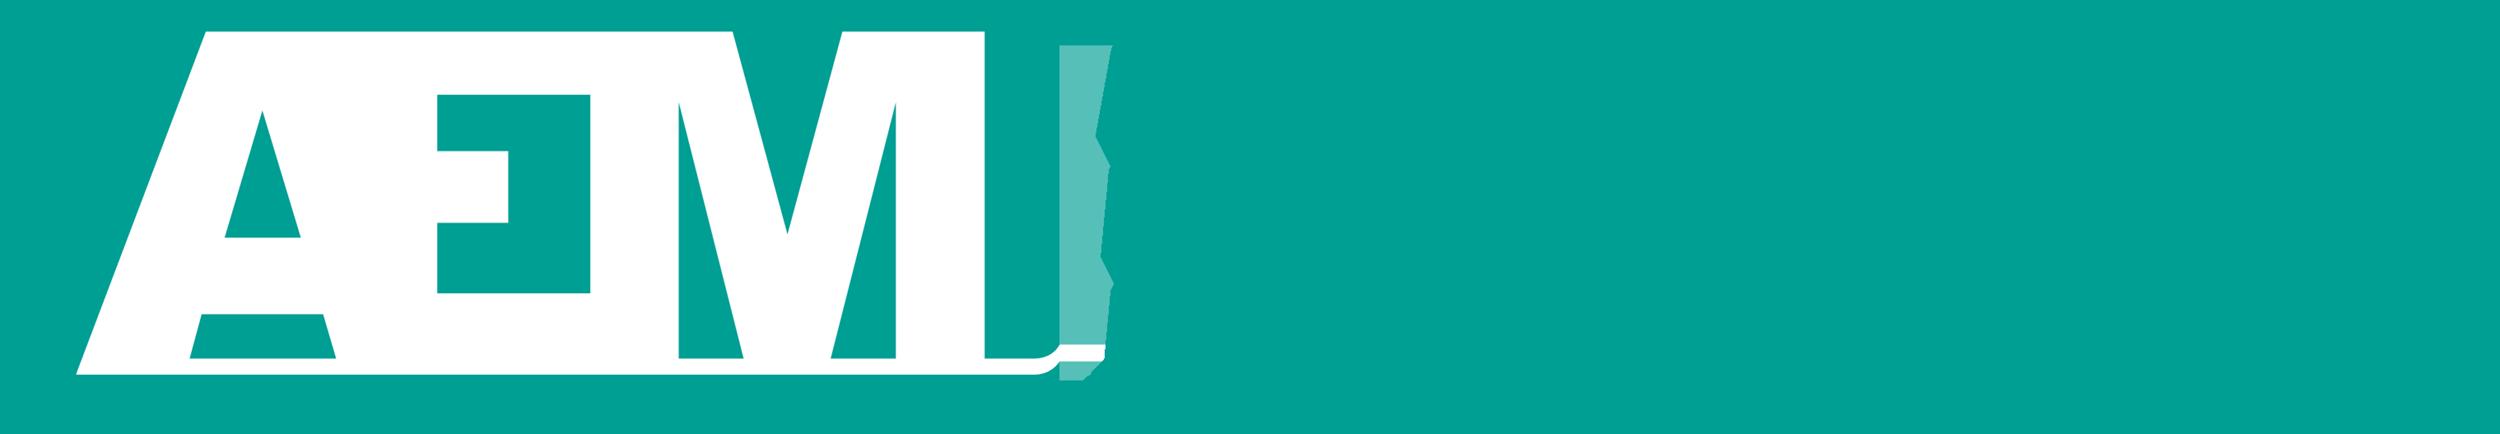 Aem Logo PNG - 114036